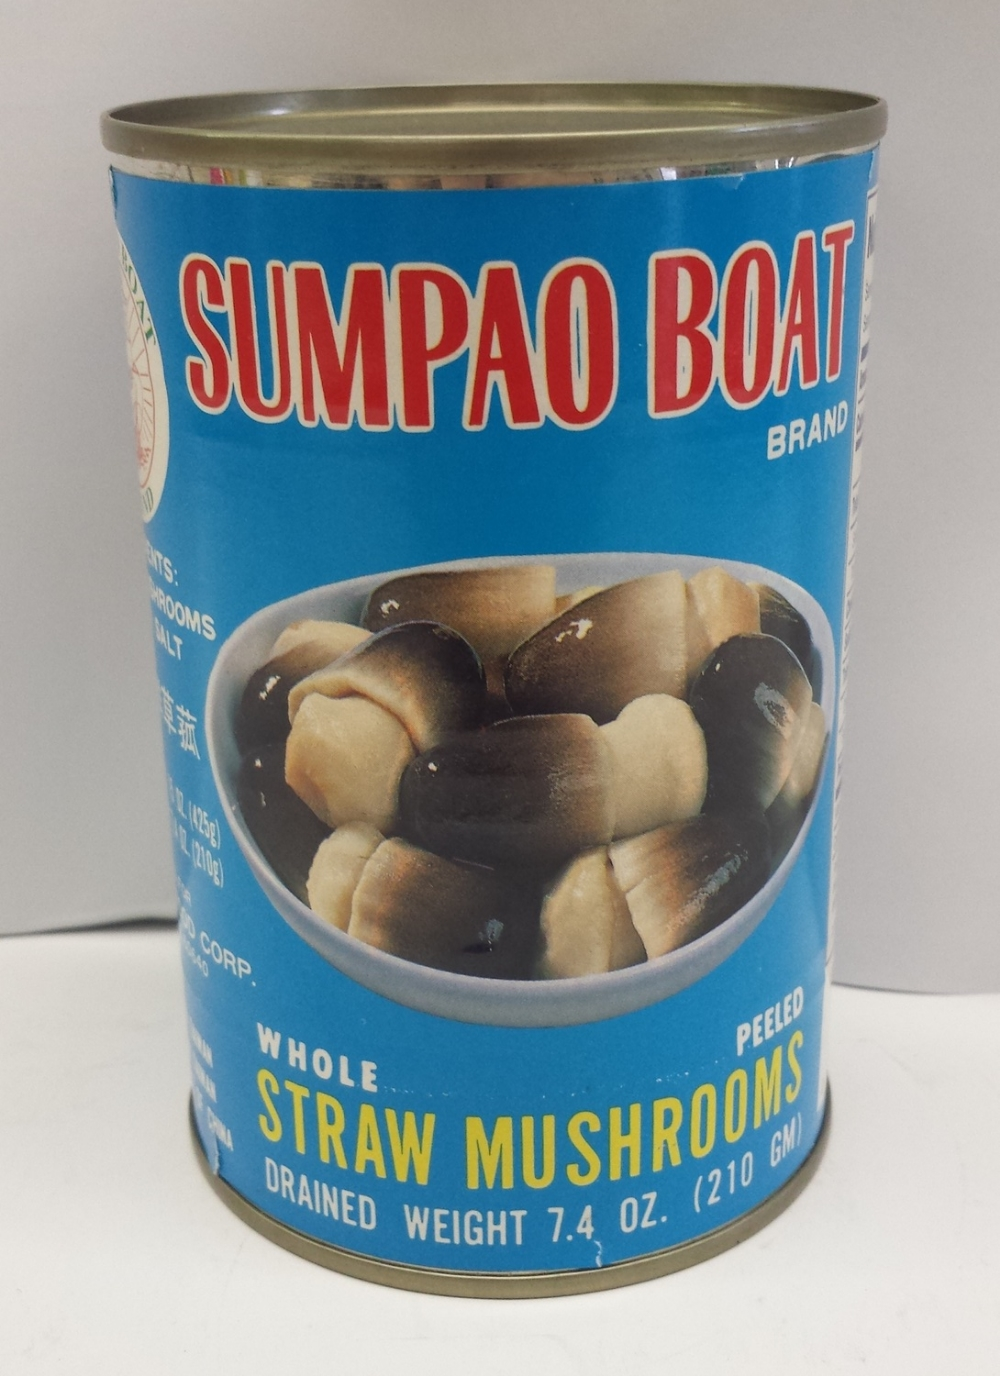 Straw Mushrooms, Whole & Peeled    Sumpao Boat   MU17261 24x15 oz